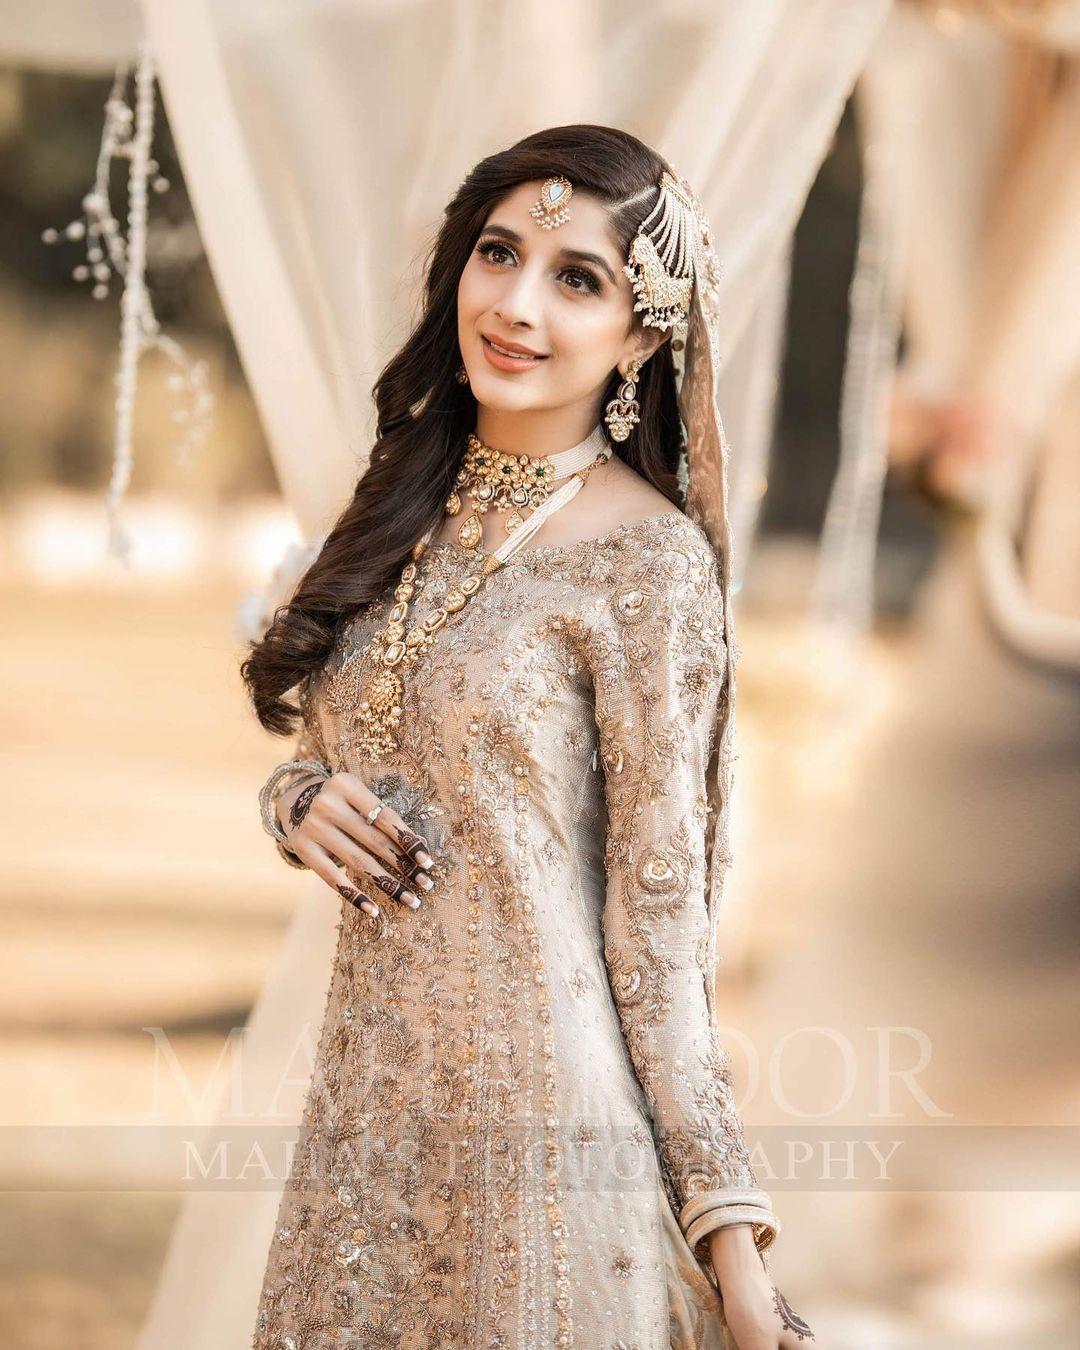 Mawra Hocane Looks Royal in her Latest Bridal Makeup Shoot